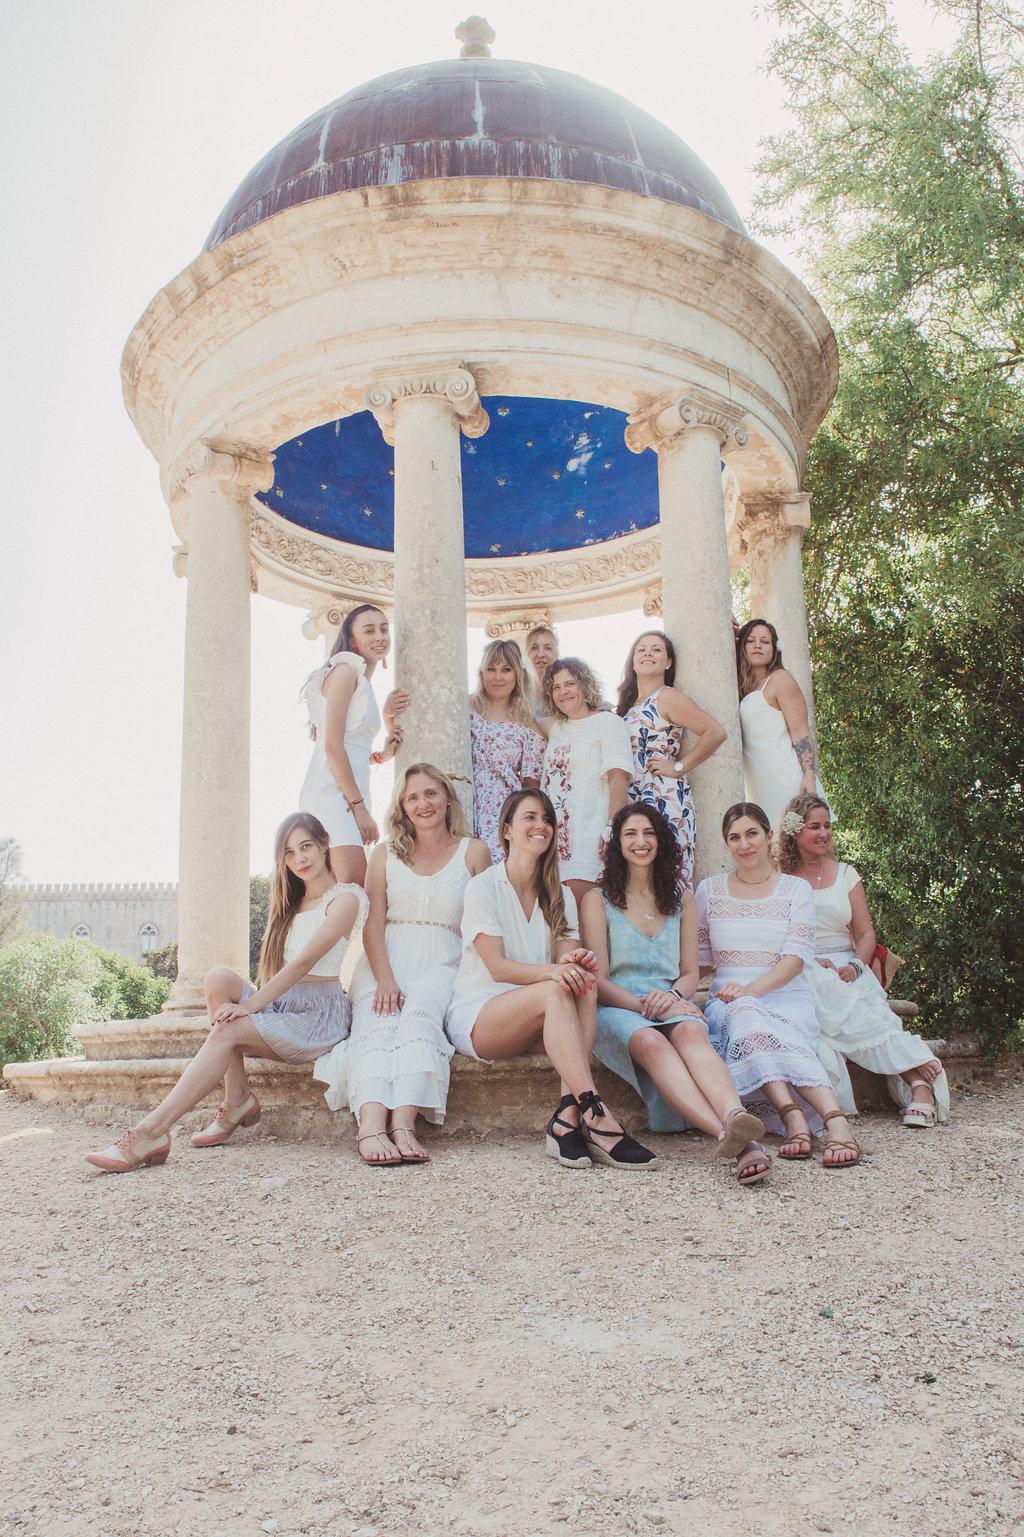 Group shot at Castello di Donnafugata garden maze